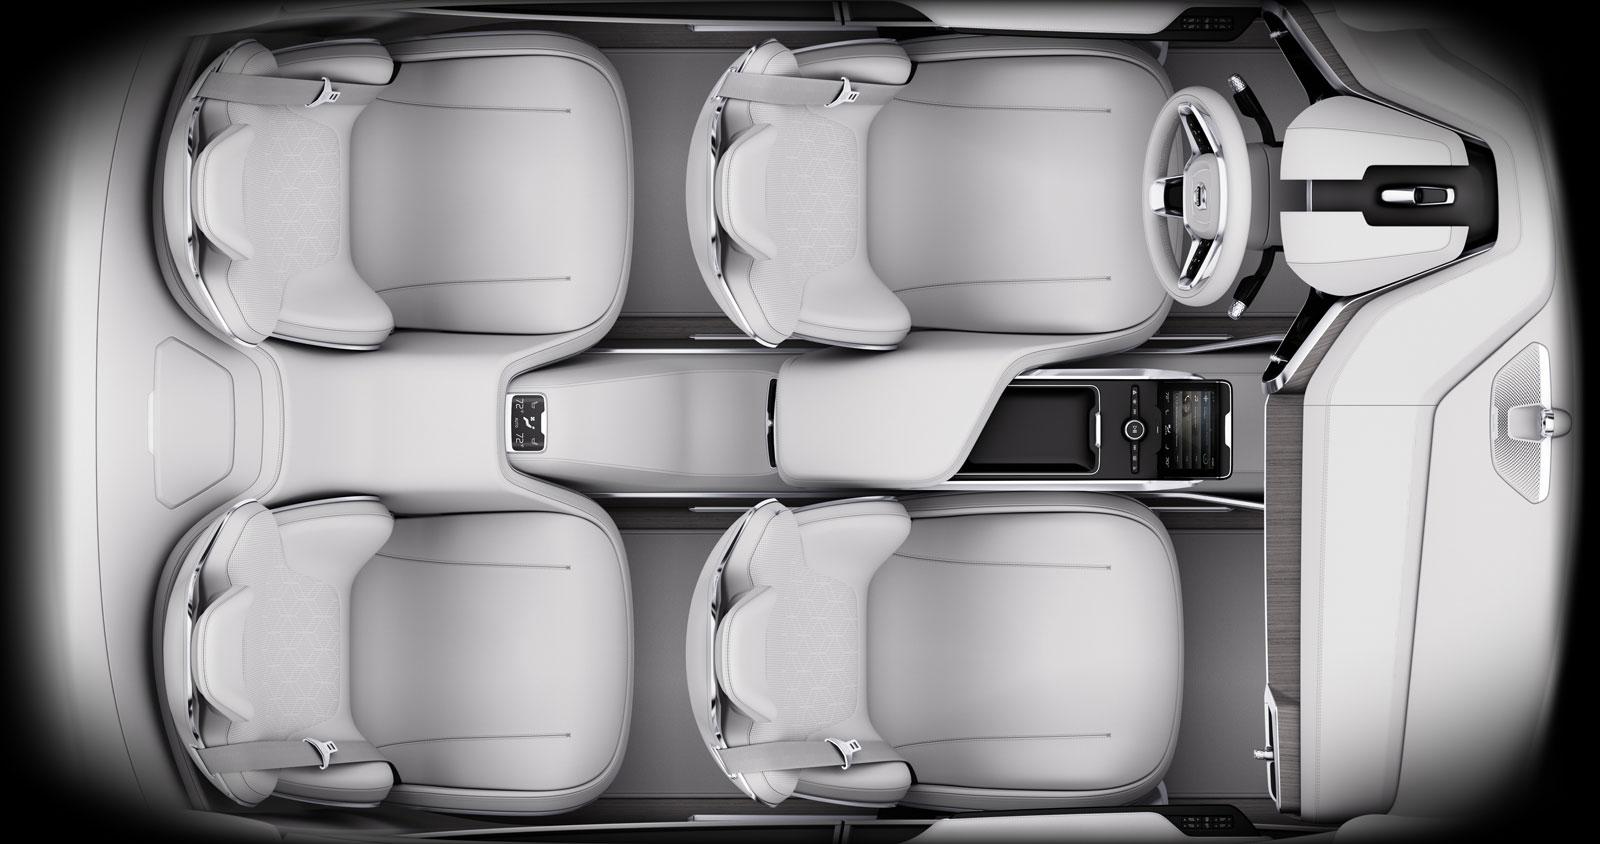 Concept 26: Volvo's vision for the future interior design of autonomous vehicles - Car Body Design